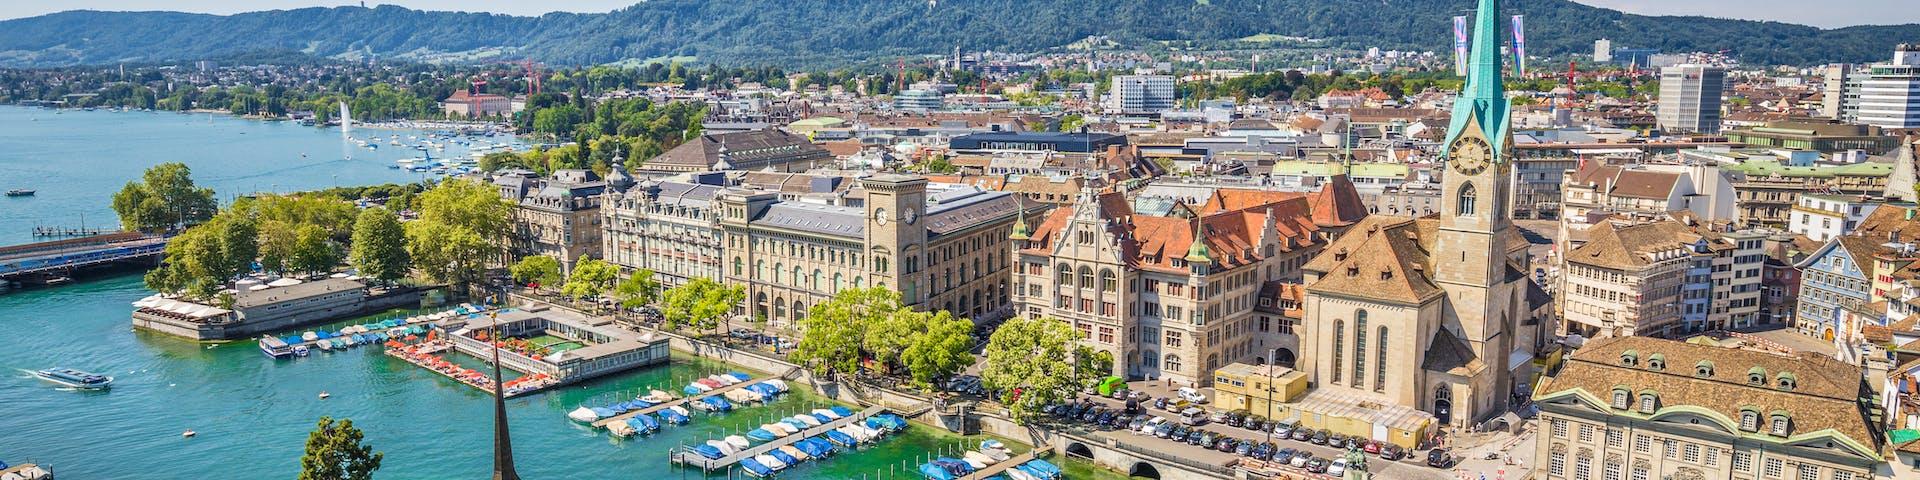 11 Top-Ranked Universities in Switzerland - World University